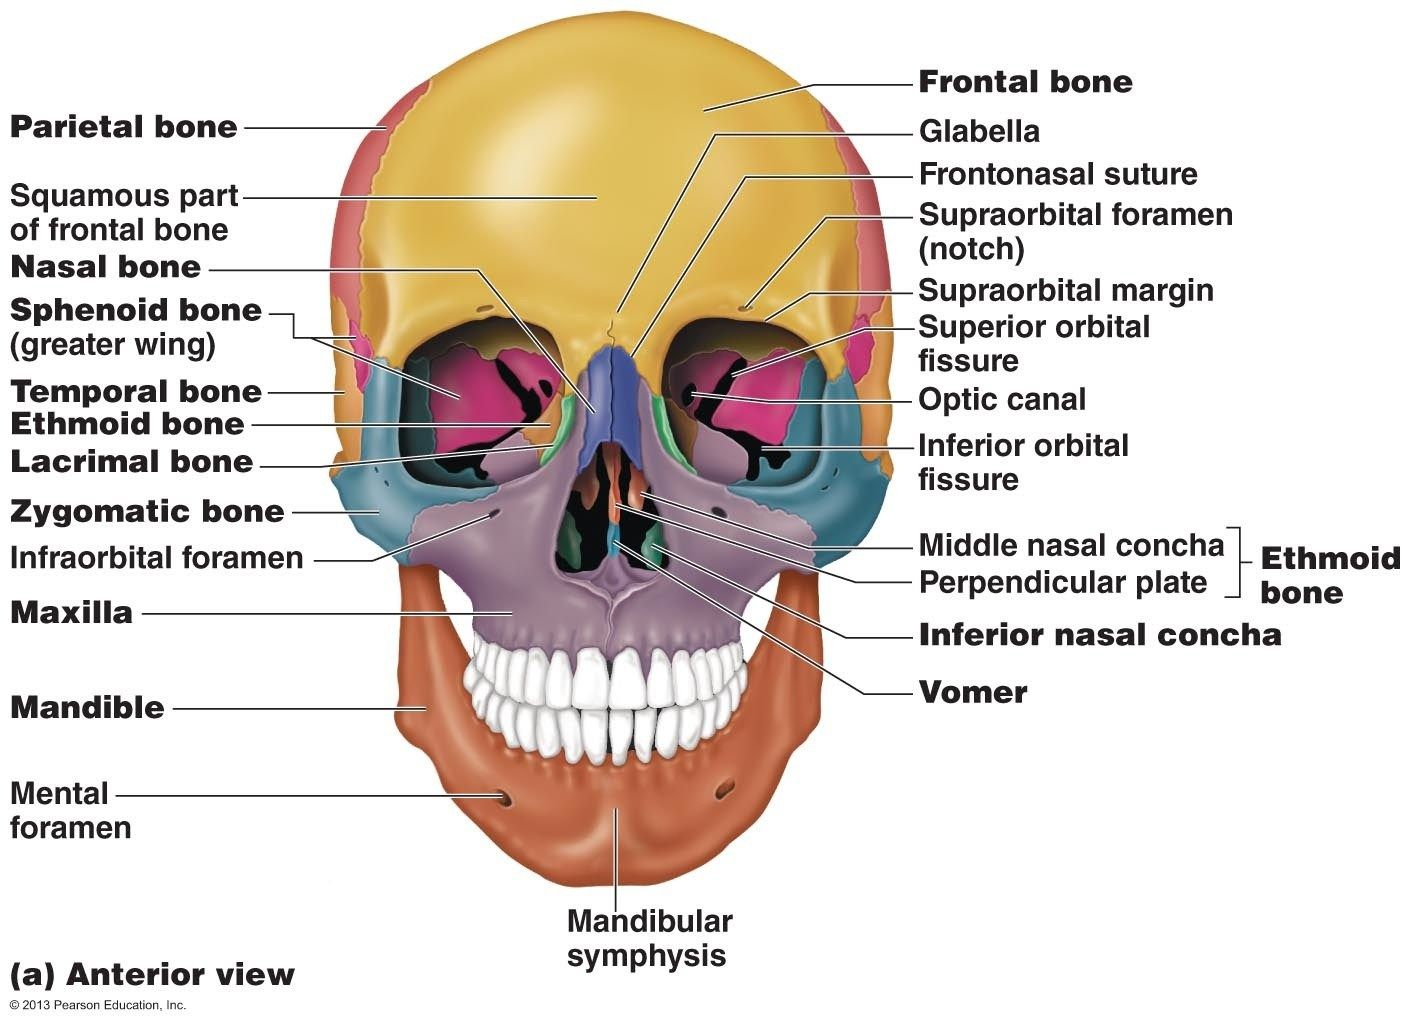 Ethmoid Bone Diagram Ethmoid Bone Diagram Diagram Of